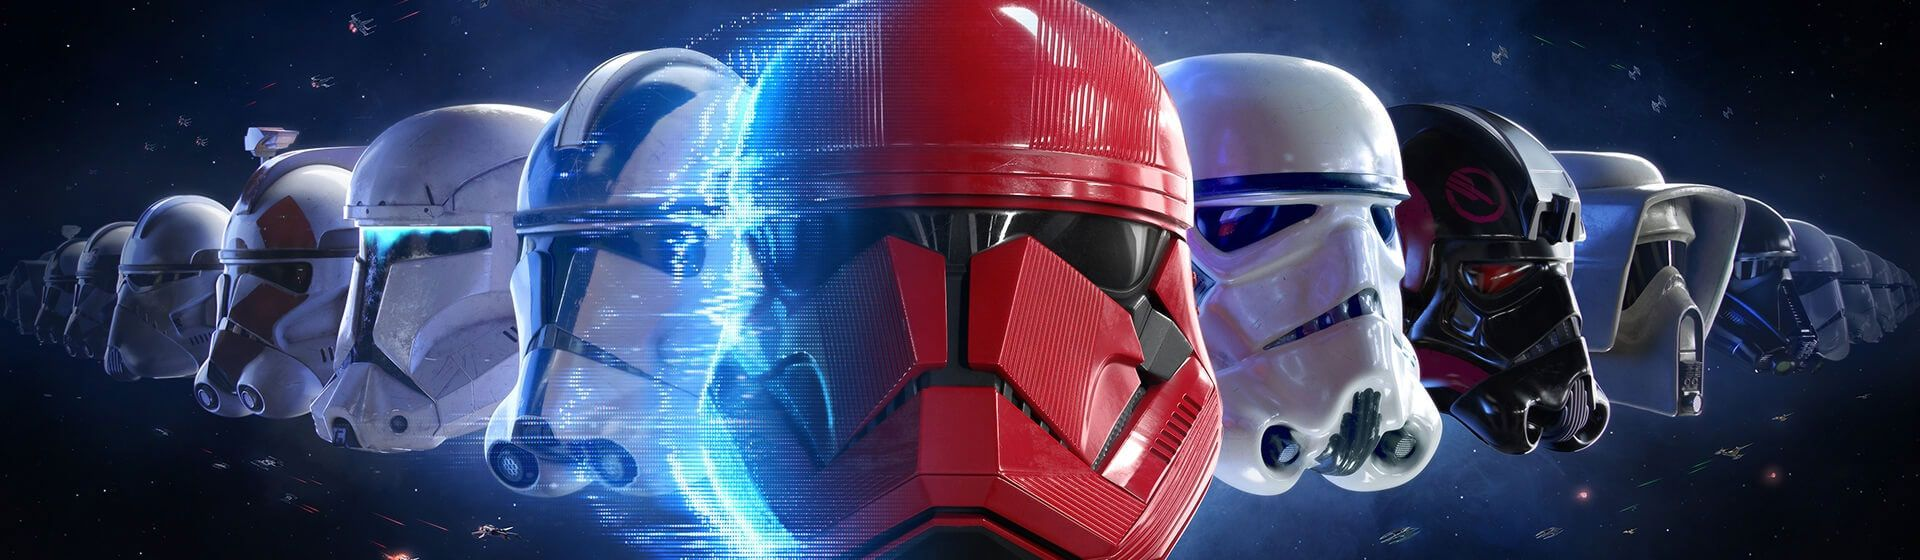 Star Wars Battlefront 2 grátis na Epic Games Store: saiba como baixar